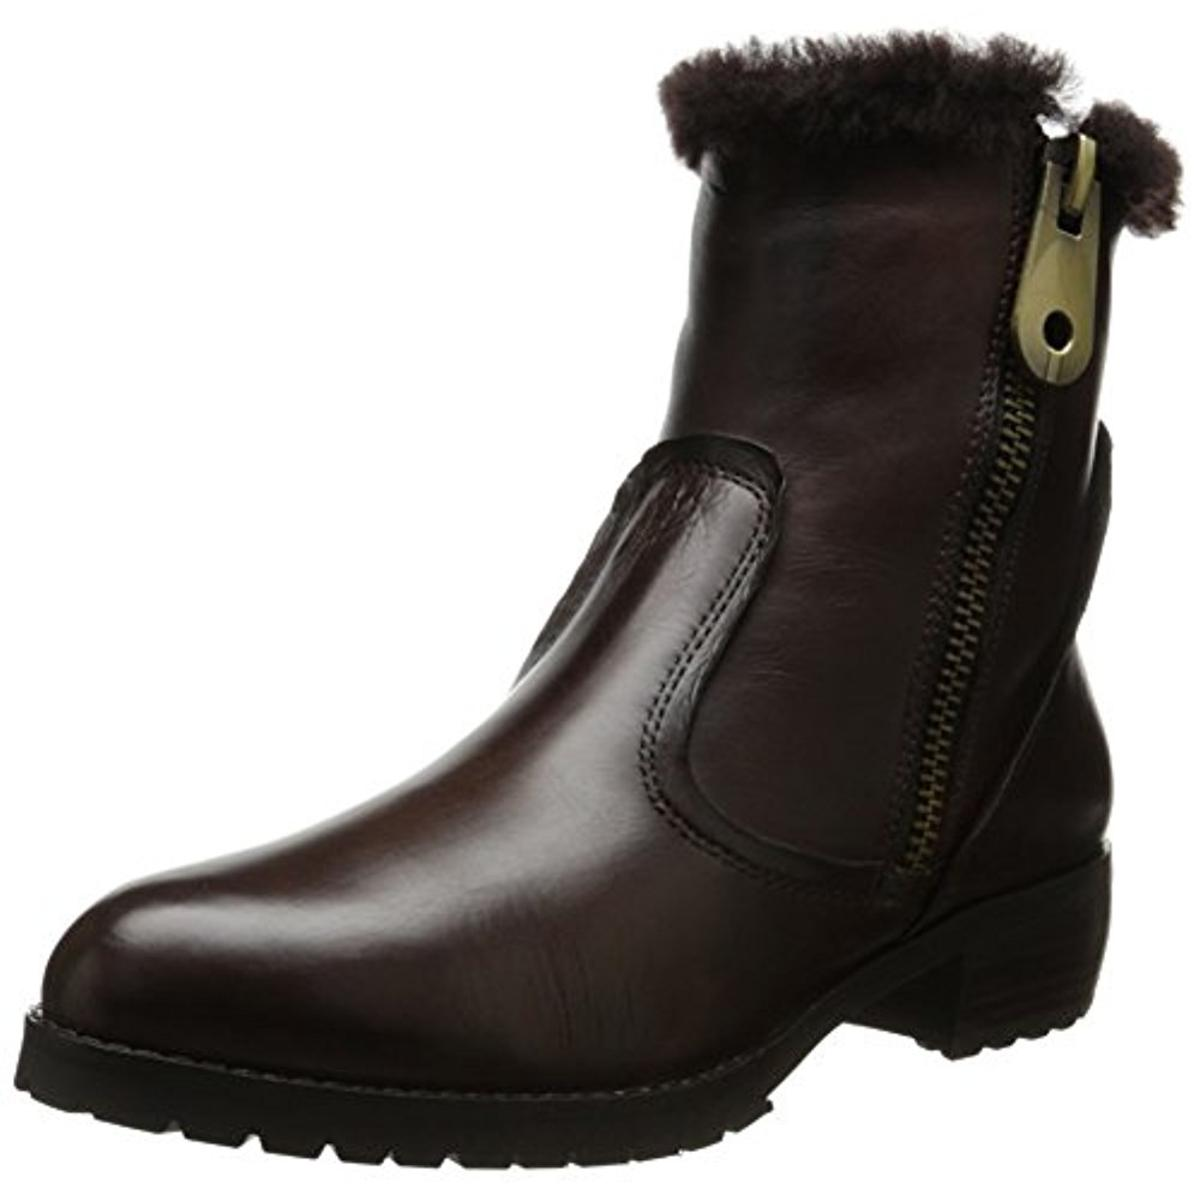 Everybody 1585 Womens Polaris Leather Faux Fur Trim Ankle